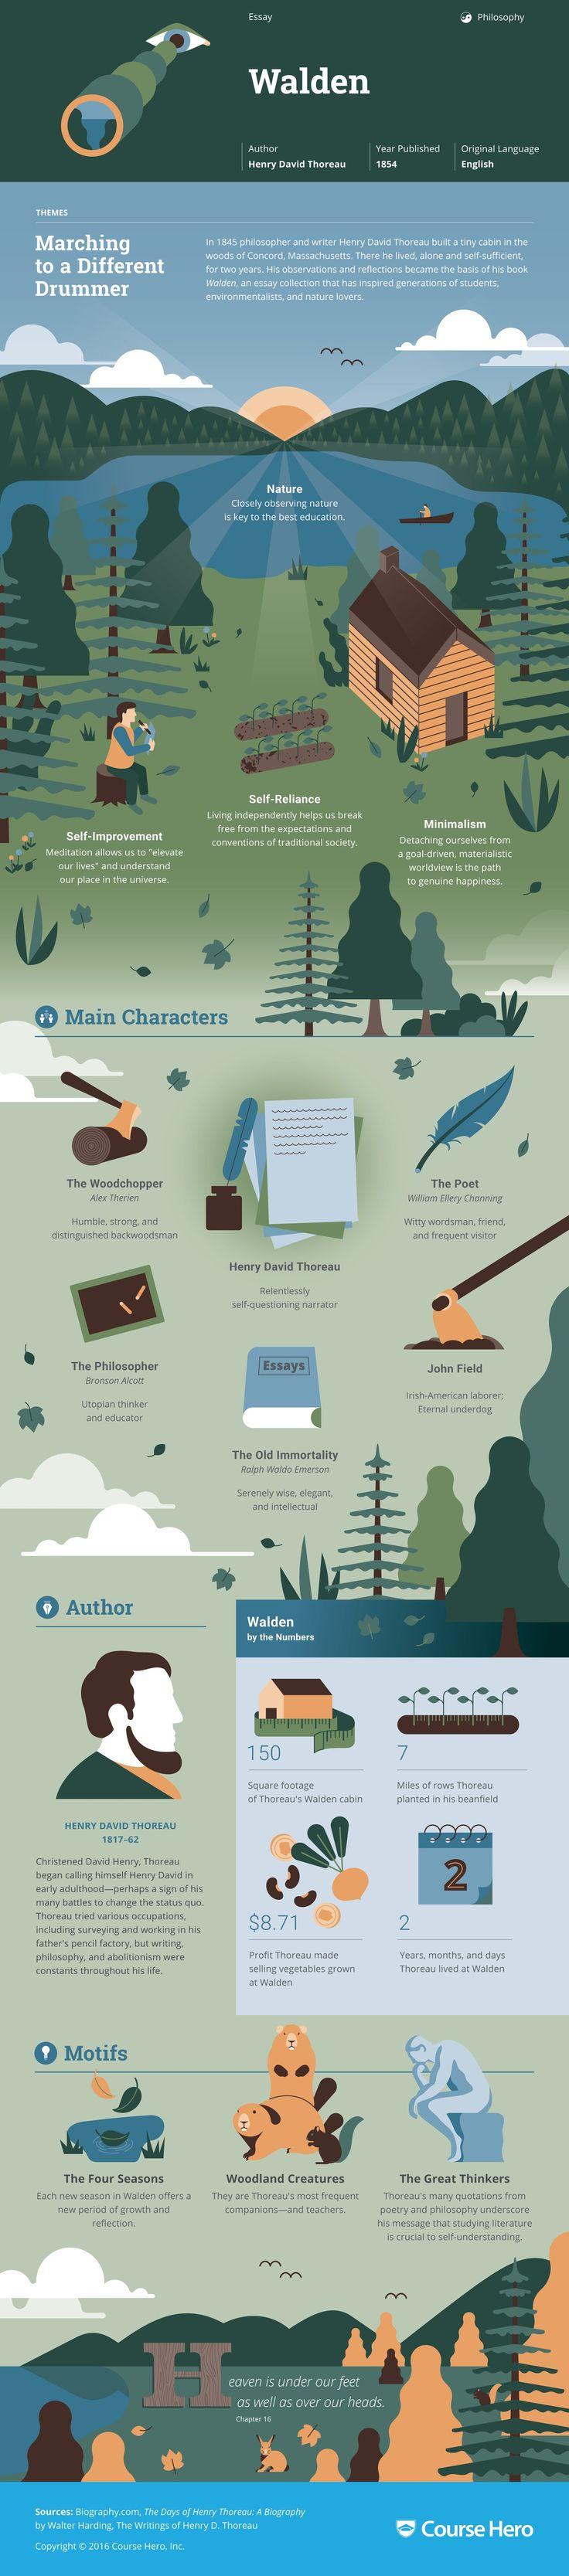 Walden Infographic | Course Hero